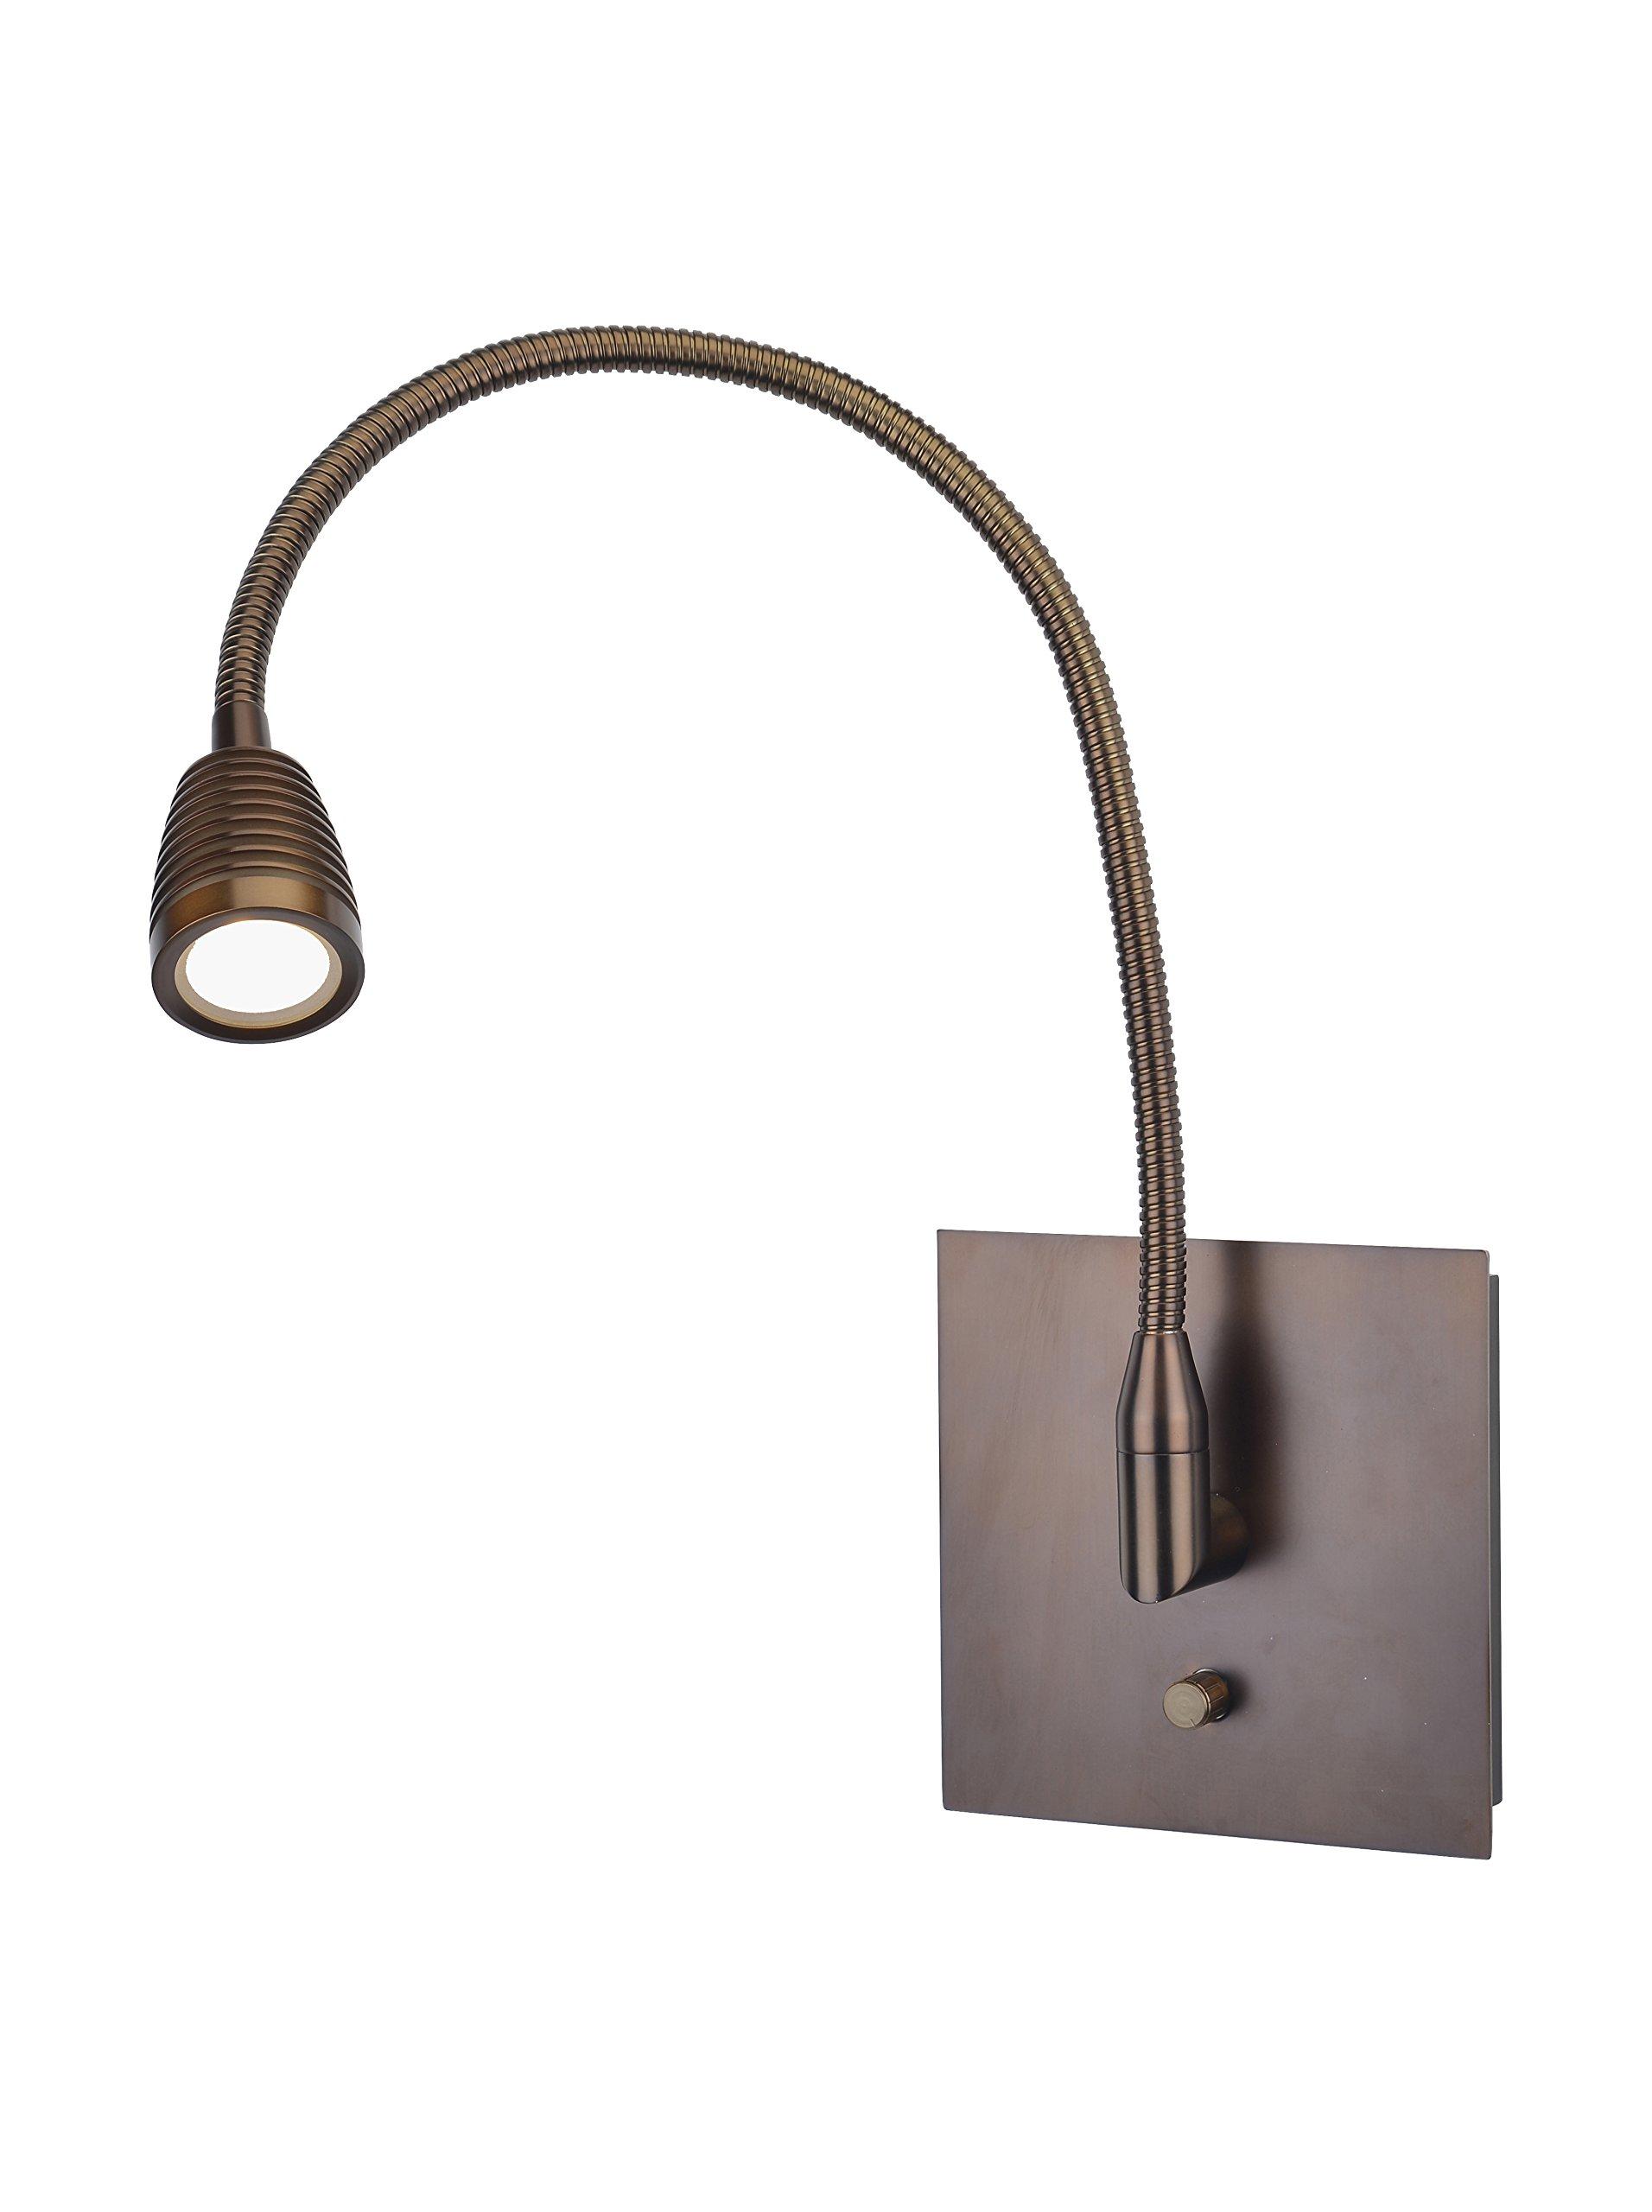 TaskWerx - LED Gooseneck Wall Task Lamp - Bronze Finish by Access Lighting